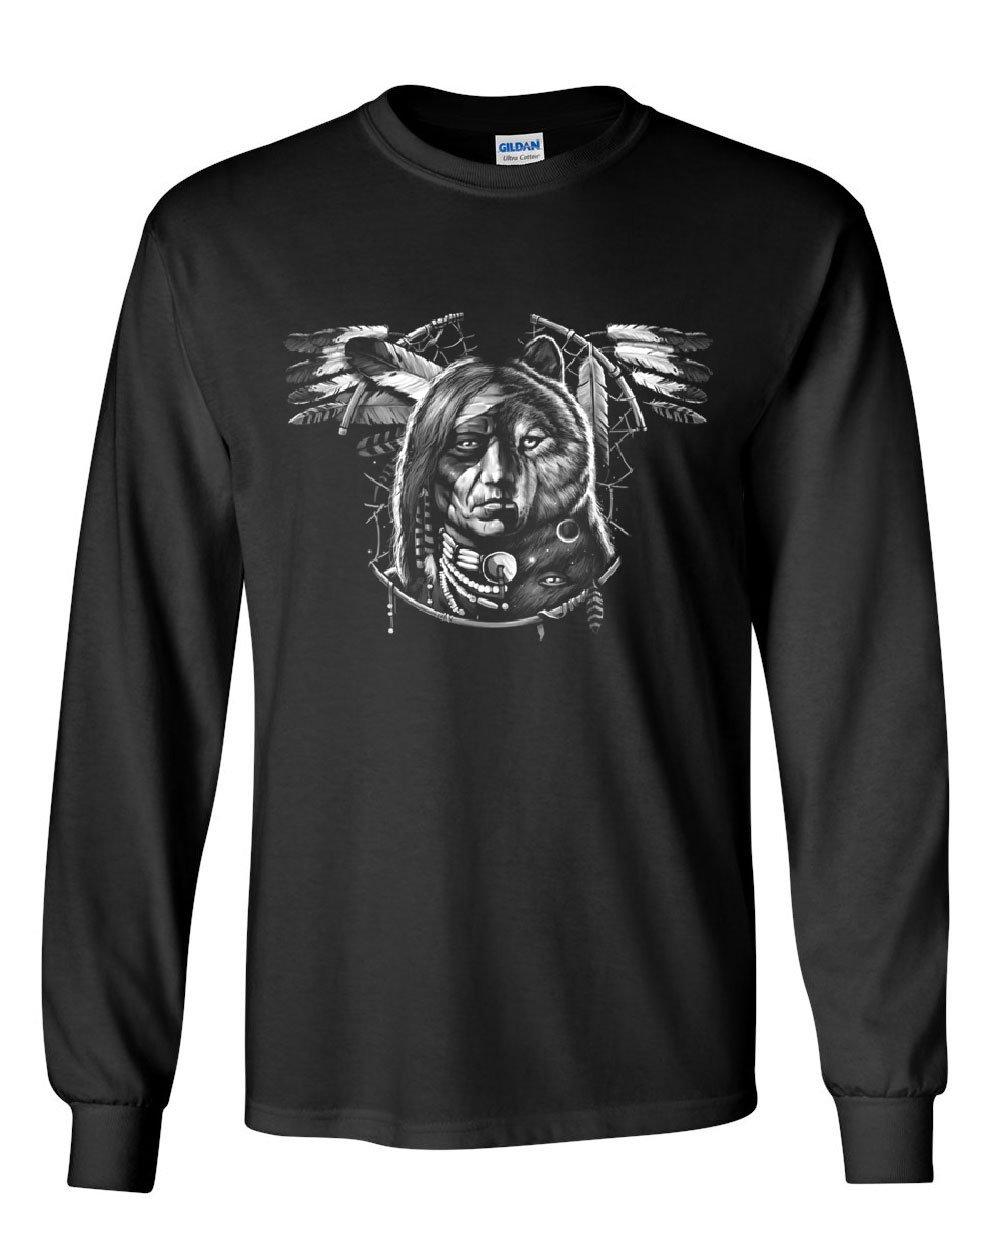 Man Wolf Spirit Dreamcat Native American Chief Tribe Shirts